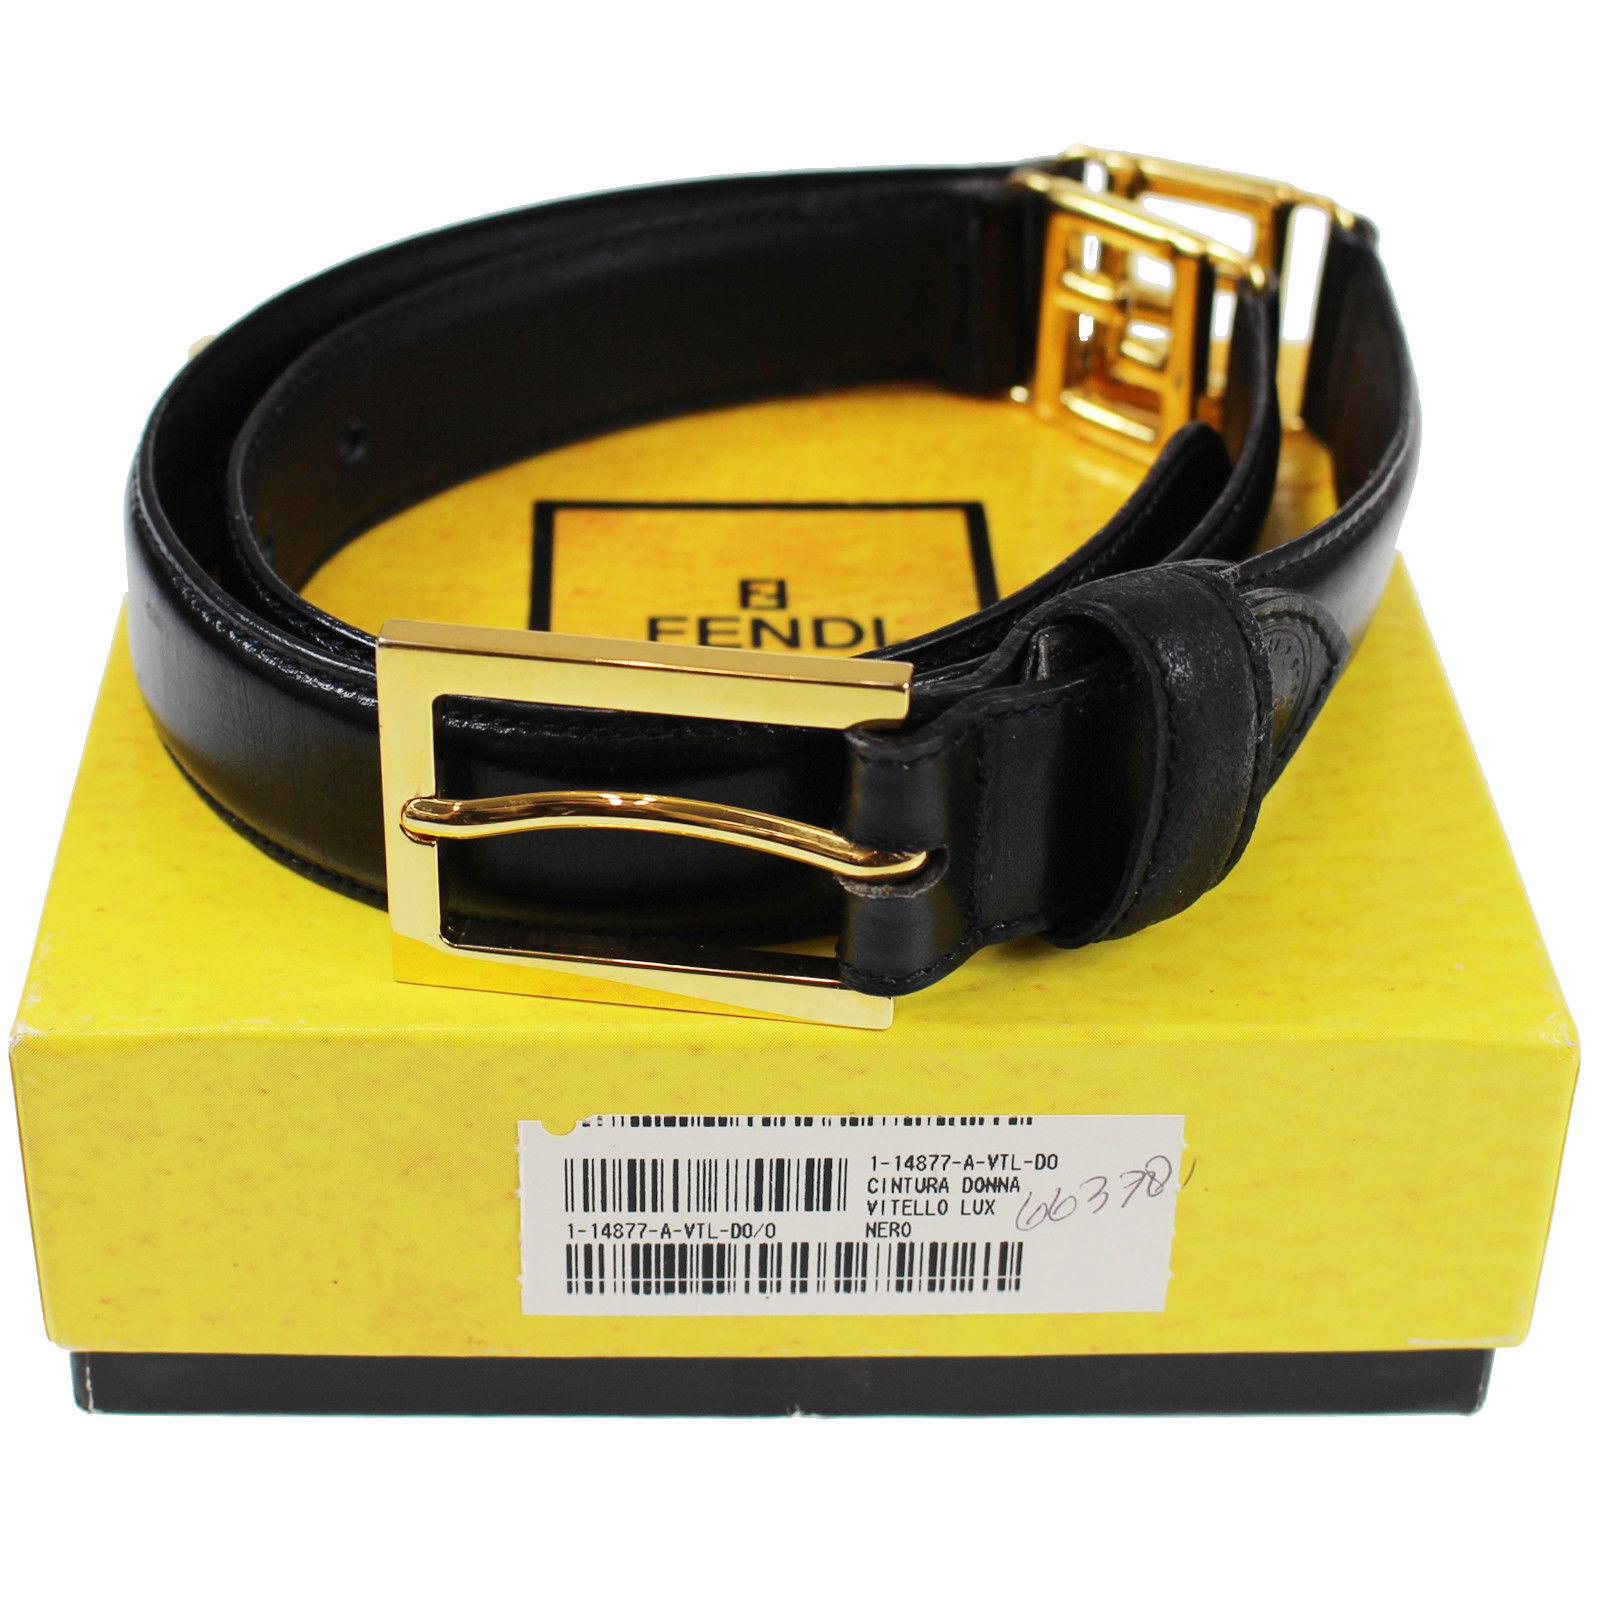 7928514bb Fendi FF Logos Belt Black Leather Gold Tone Size 38 Vintage Italy ...